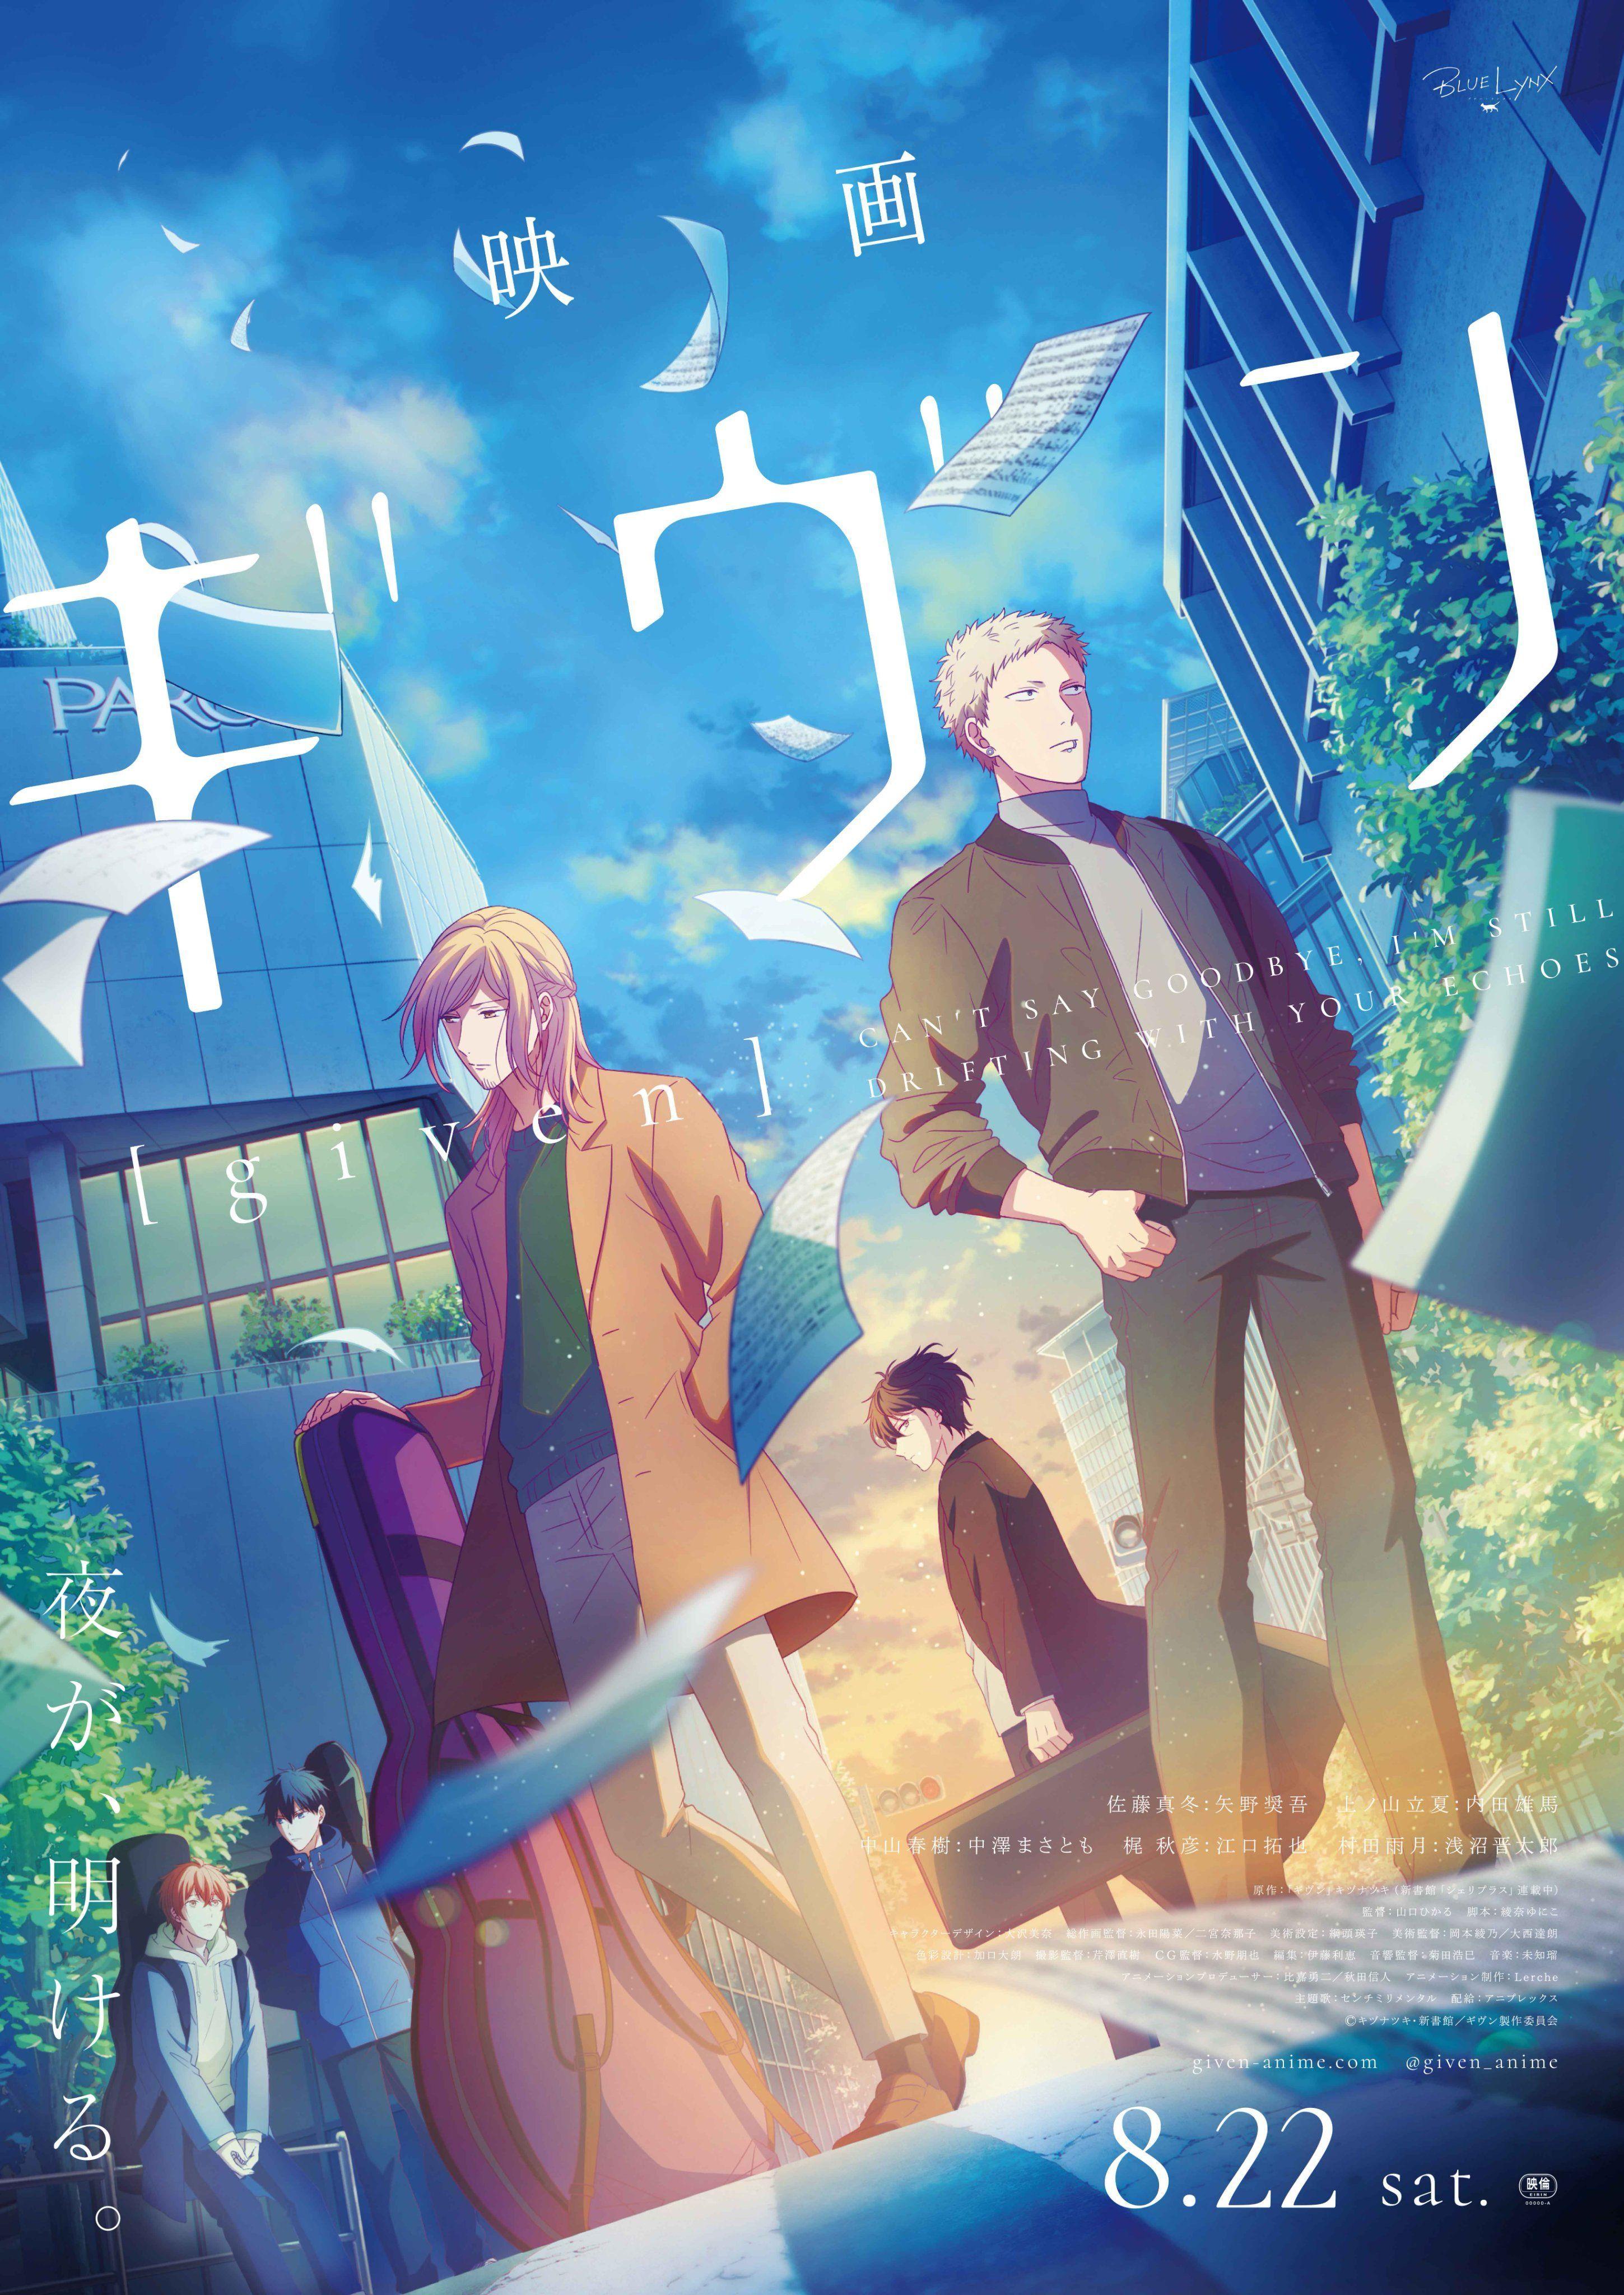 Given Anime Filme Estreia Em Agosto Given Anime Filme Estreia Em Agosto Acesse Na Imagem Given Anime Manga Otaku Ja Anime Anime Wall Art Anime Music